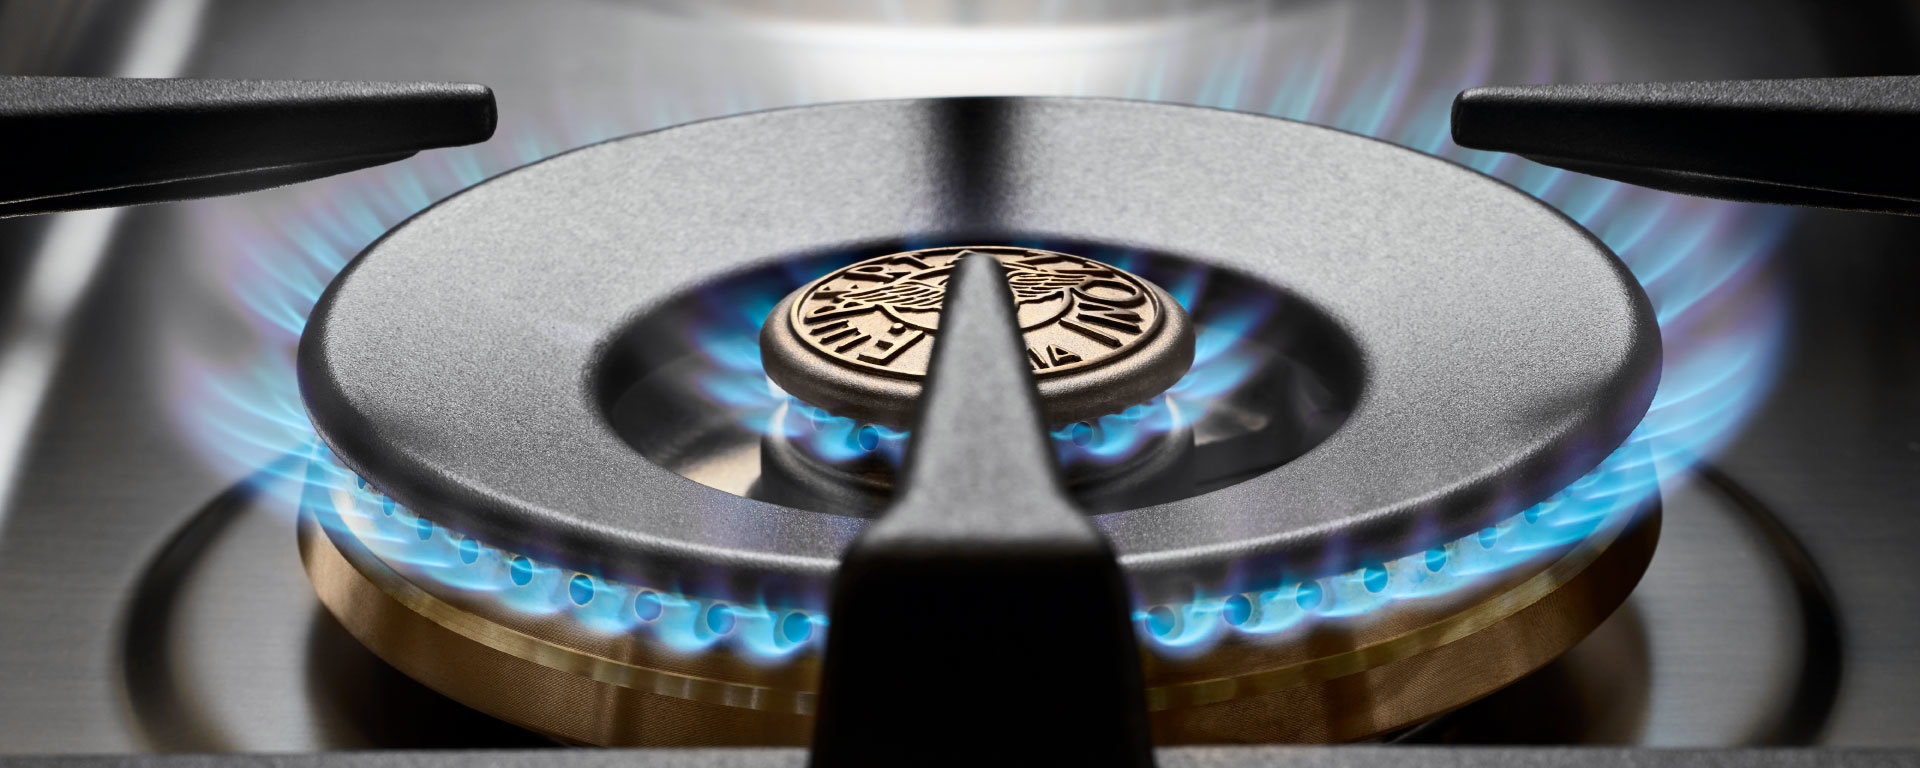 Газовая плита Bertazzoni PRO1006MFEDXT